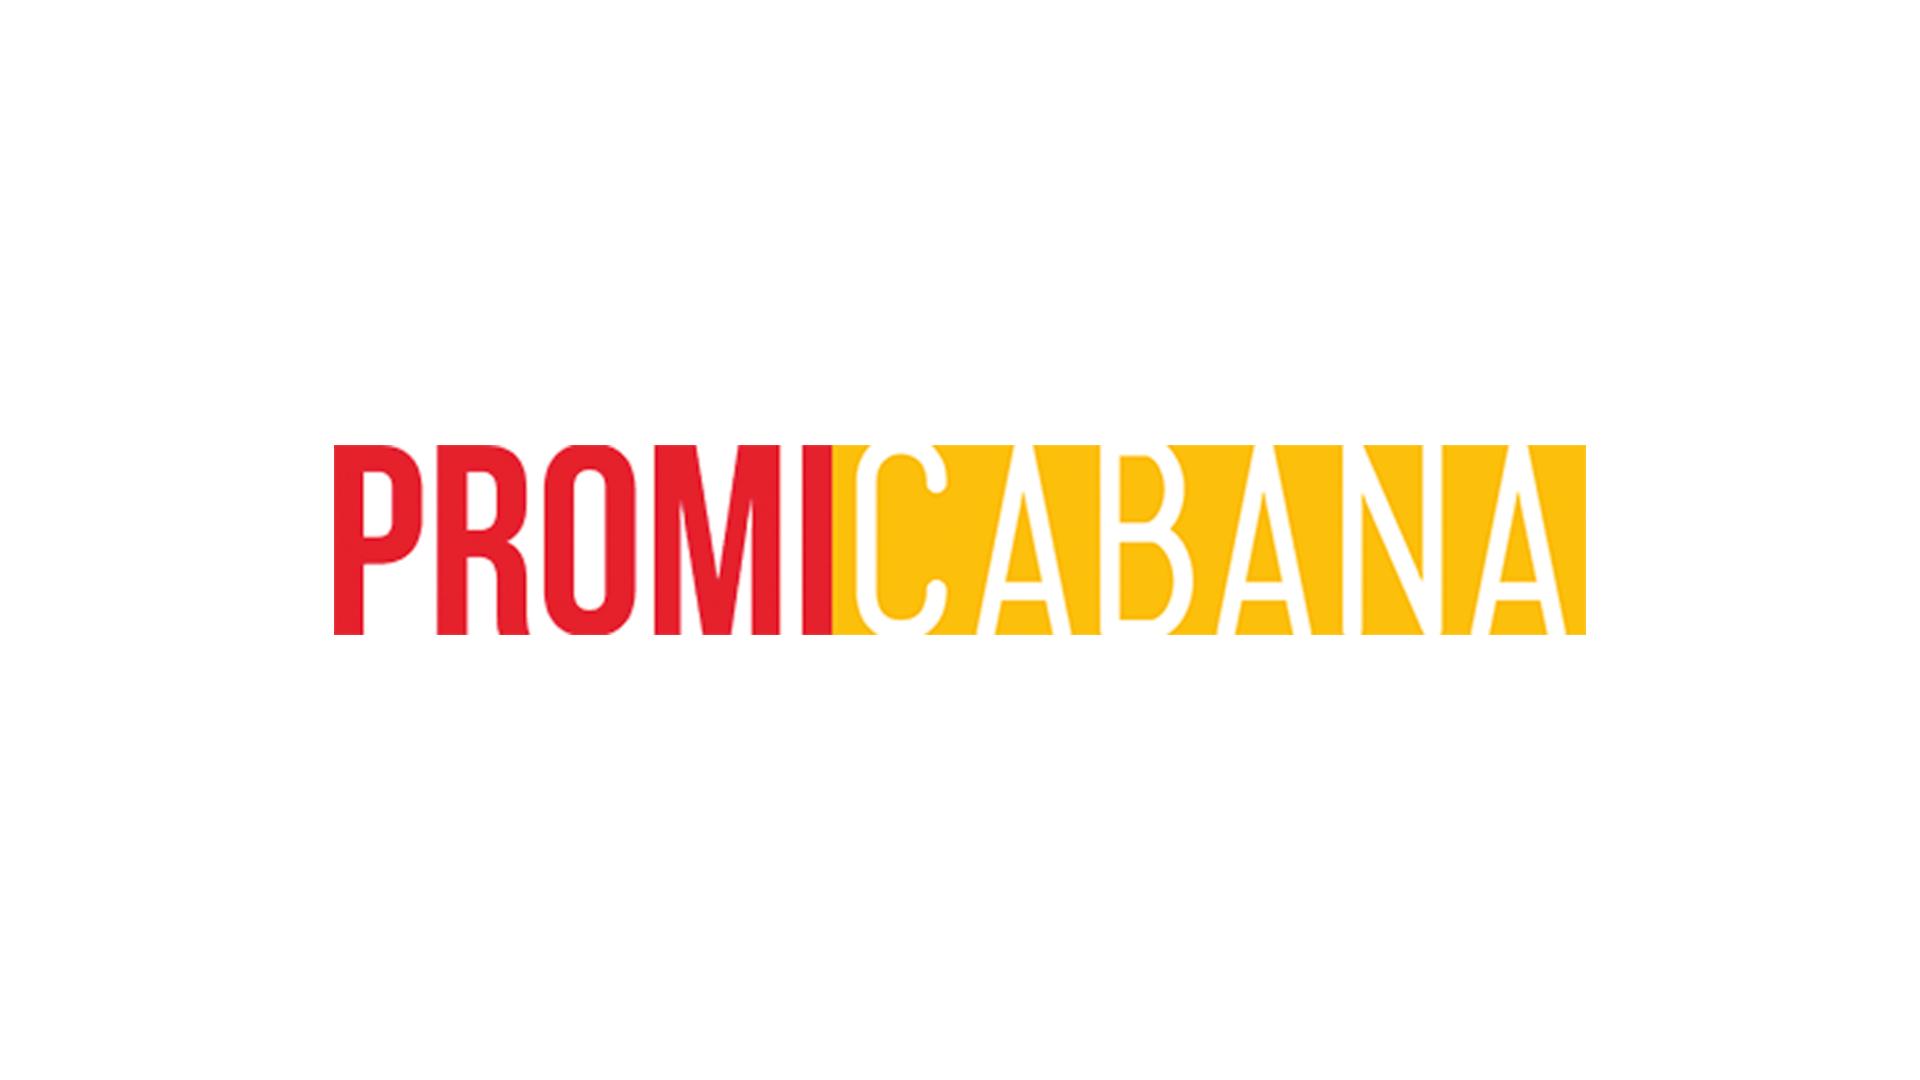 Justin-Bieber-Selena-Gomez-Met-Gala-2015